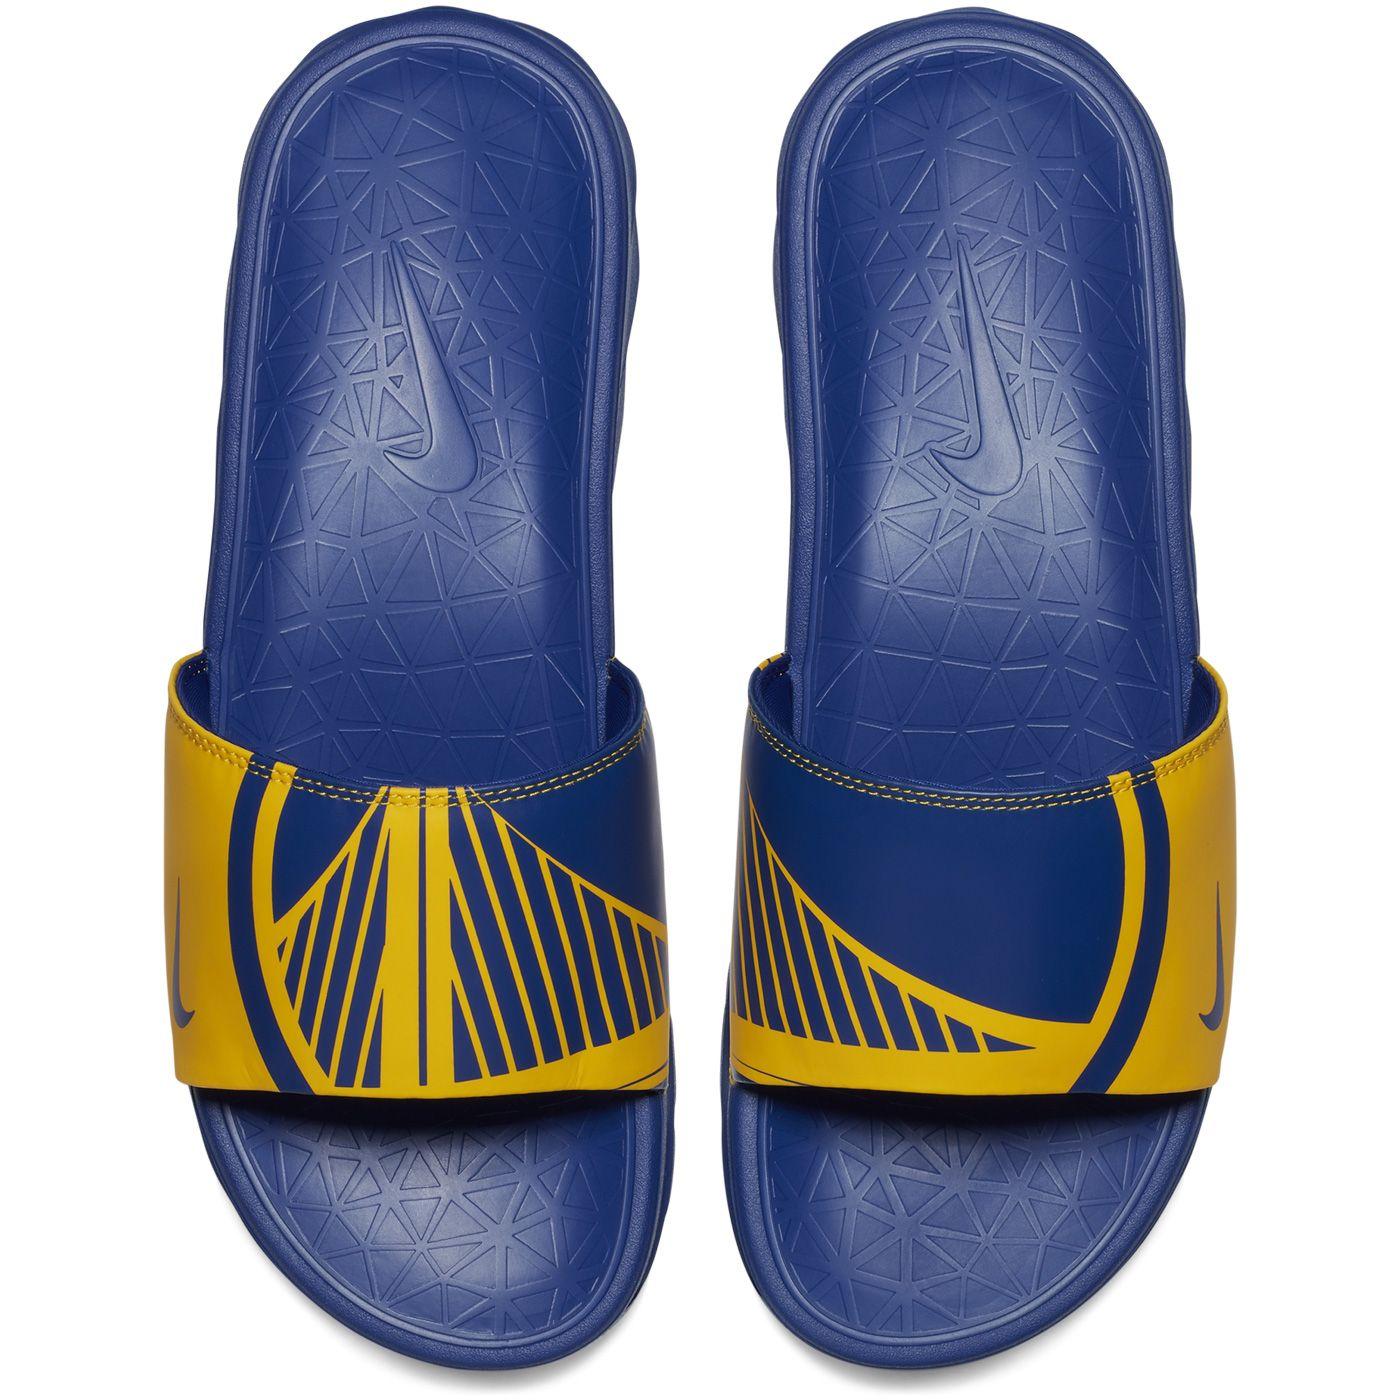 huge selection of a28e1 5565f Golden State Warriors Nike Benassi Solarsoft NBA Slides - Royal Gold